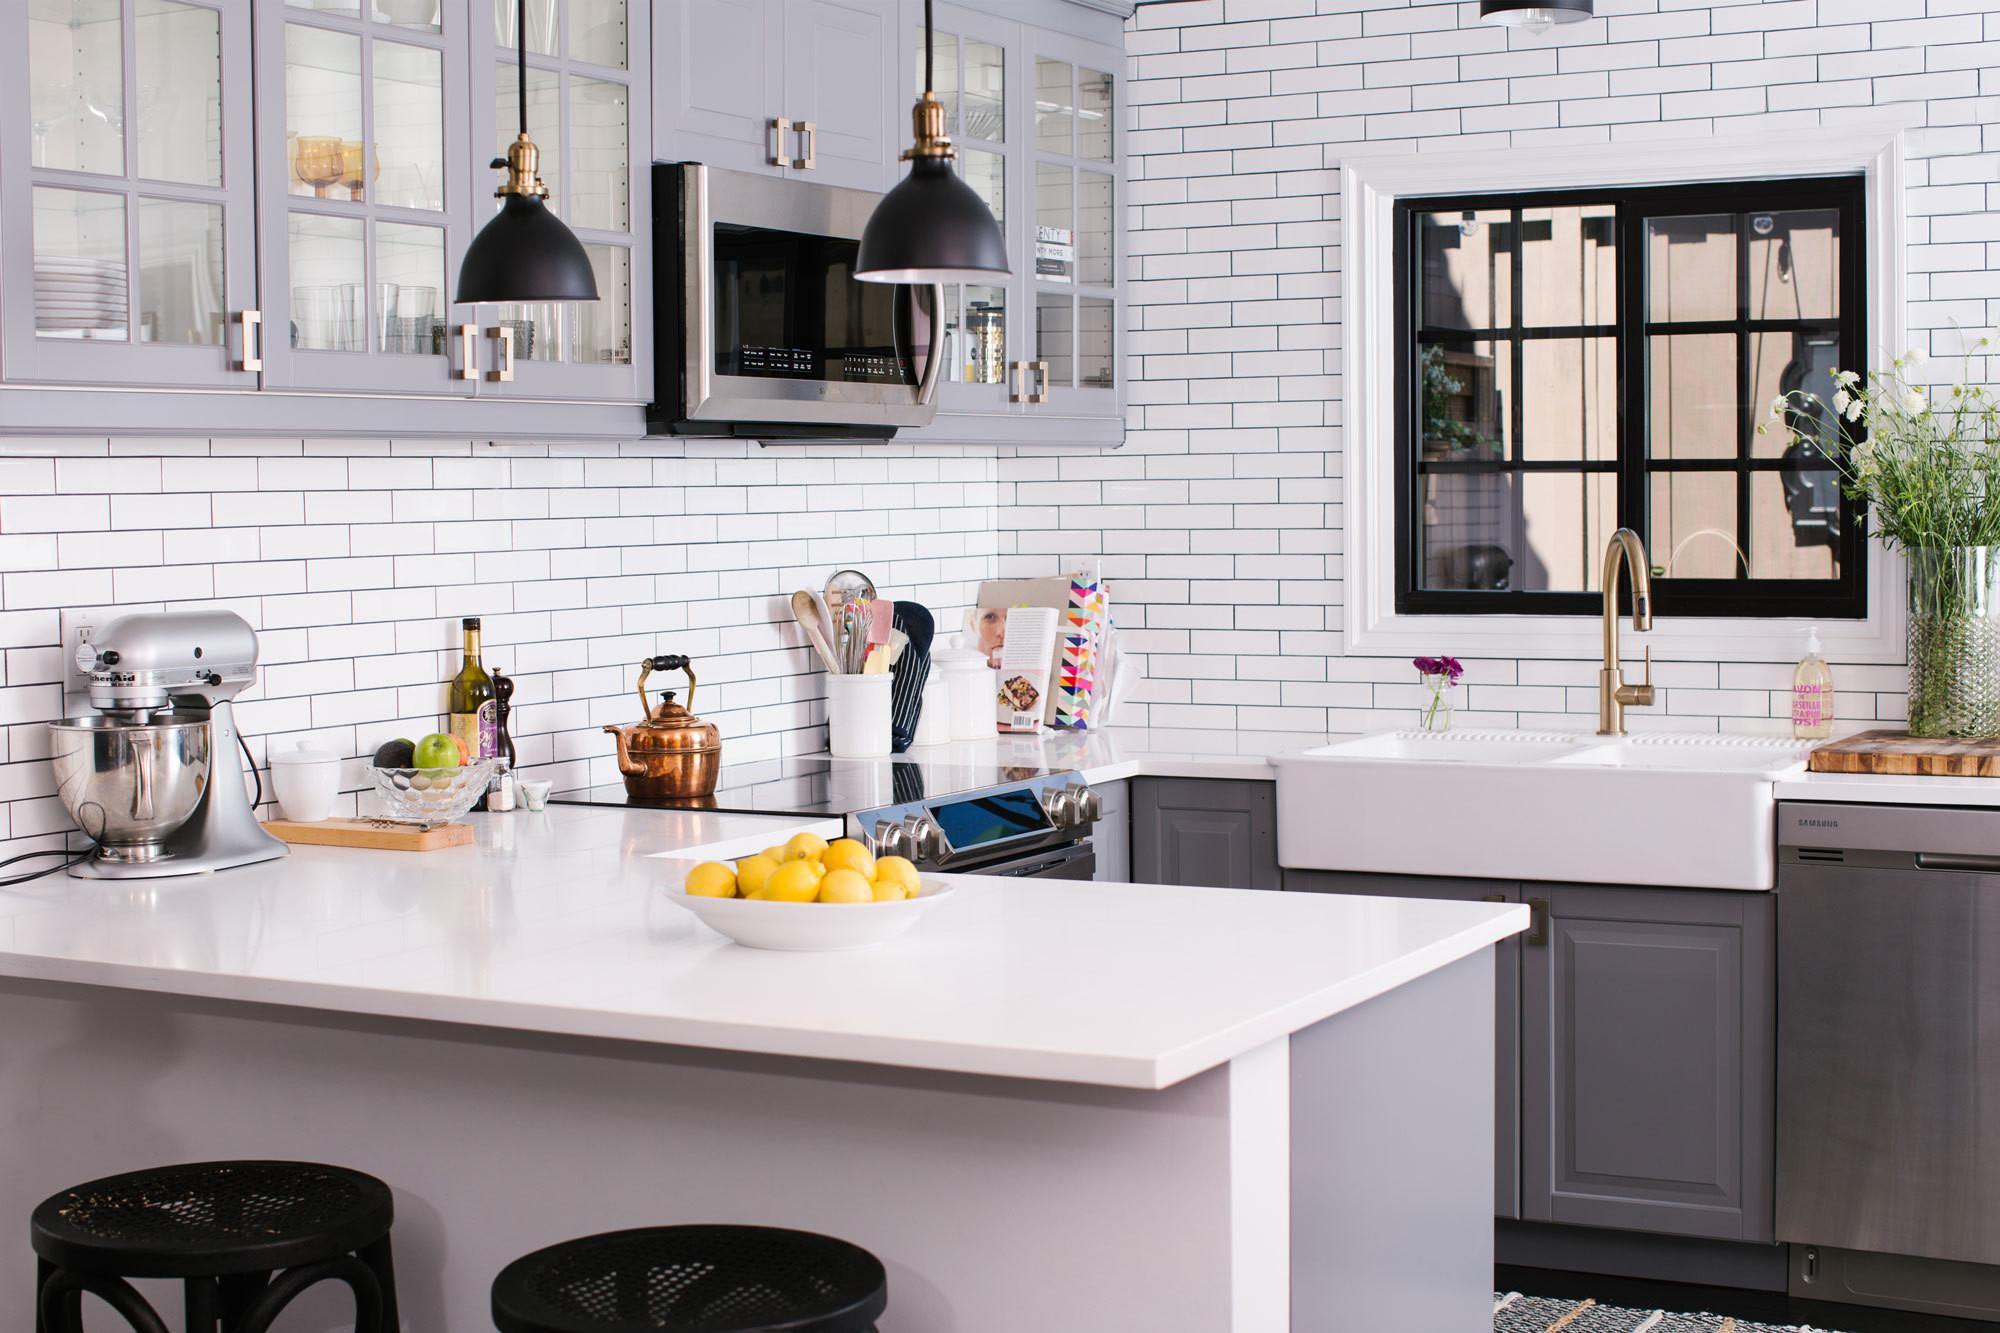 CAITLIN MCCARTHY HANDCOCK PARK Kitchen 4.jpg